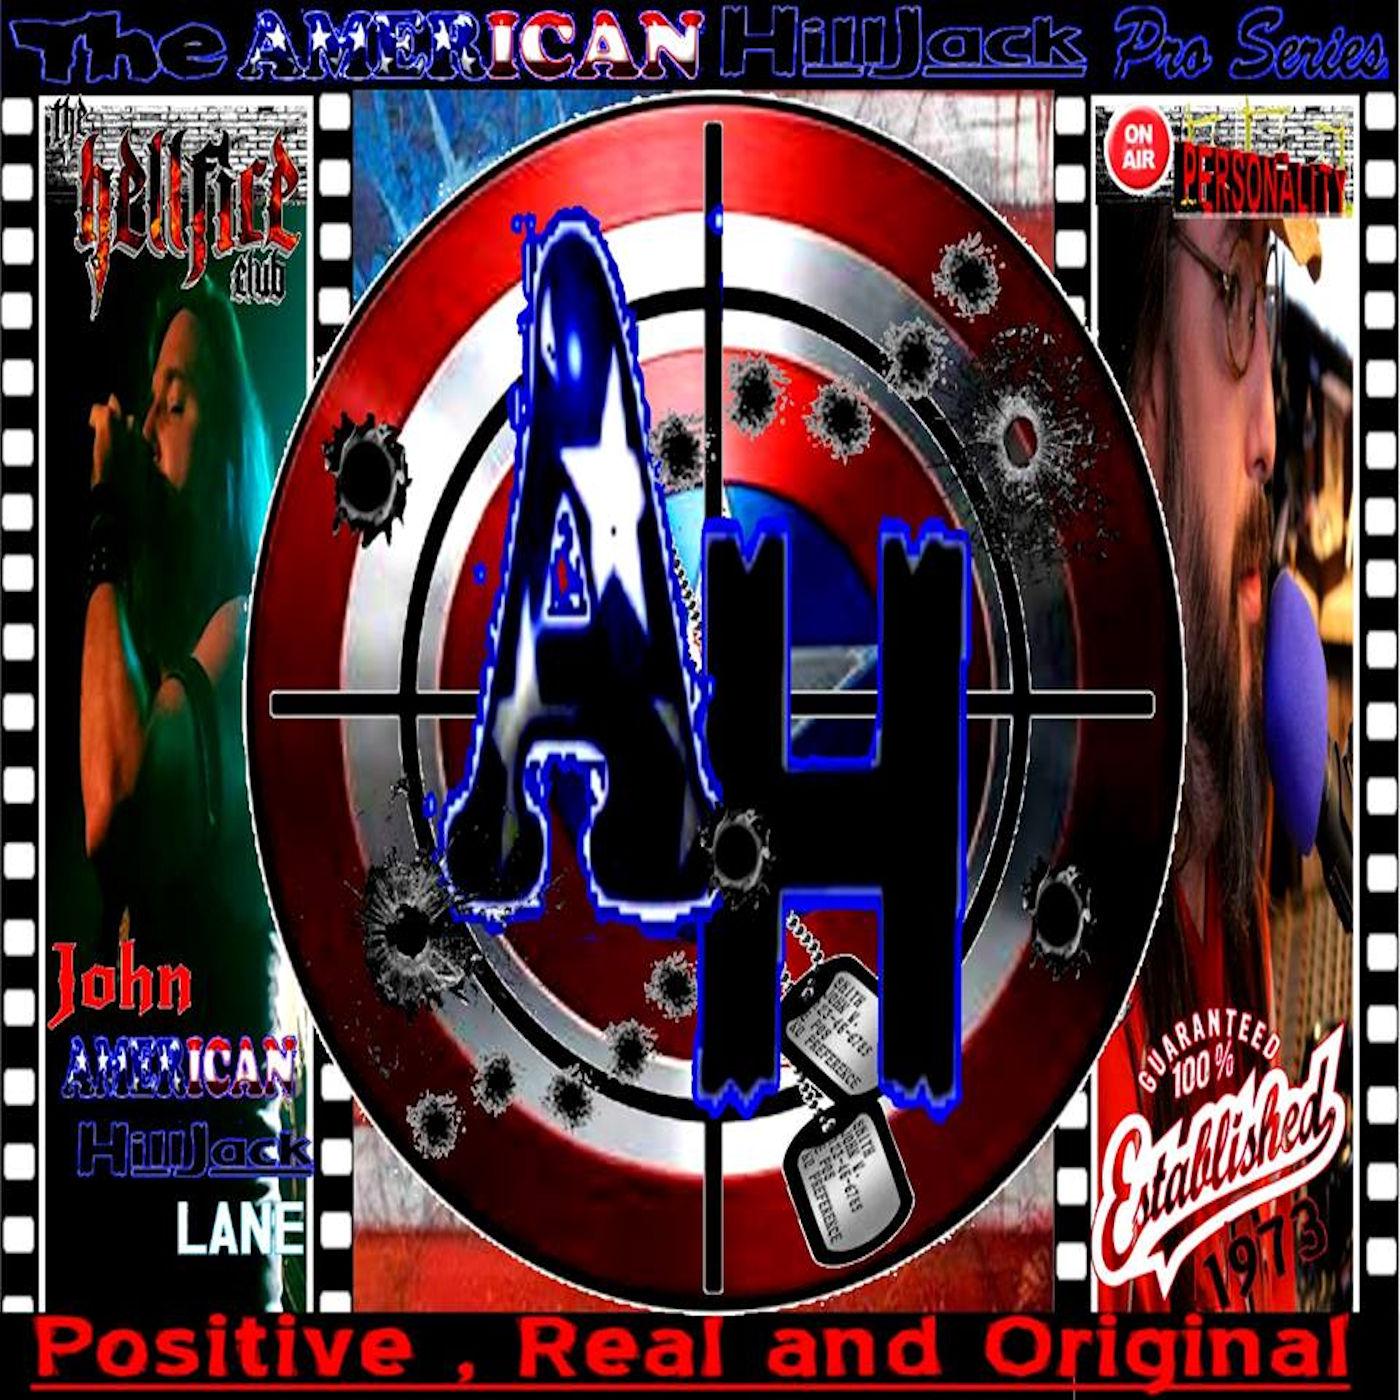 The American Hilljack Pro Series Radio